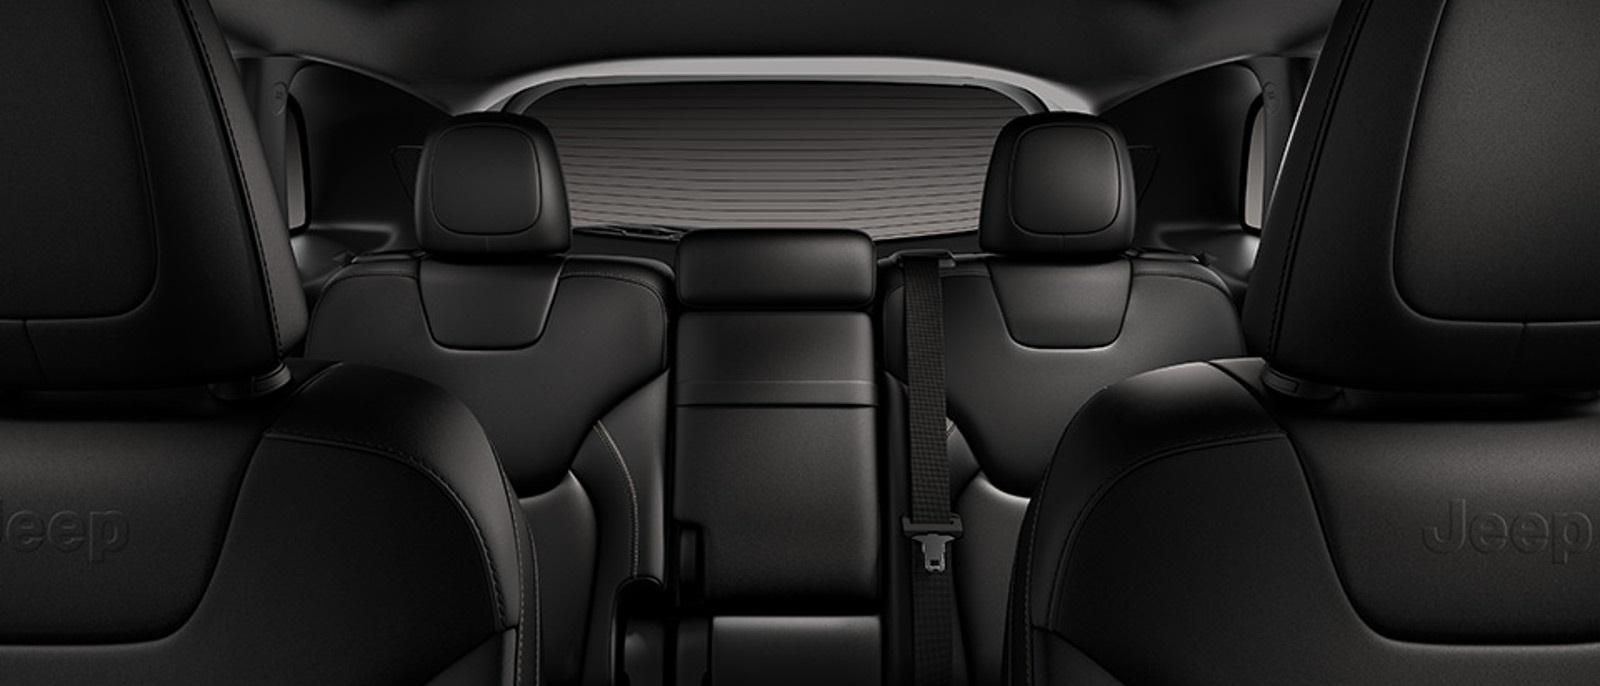 2015 Jeep Cherokee Seats